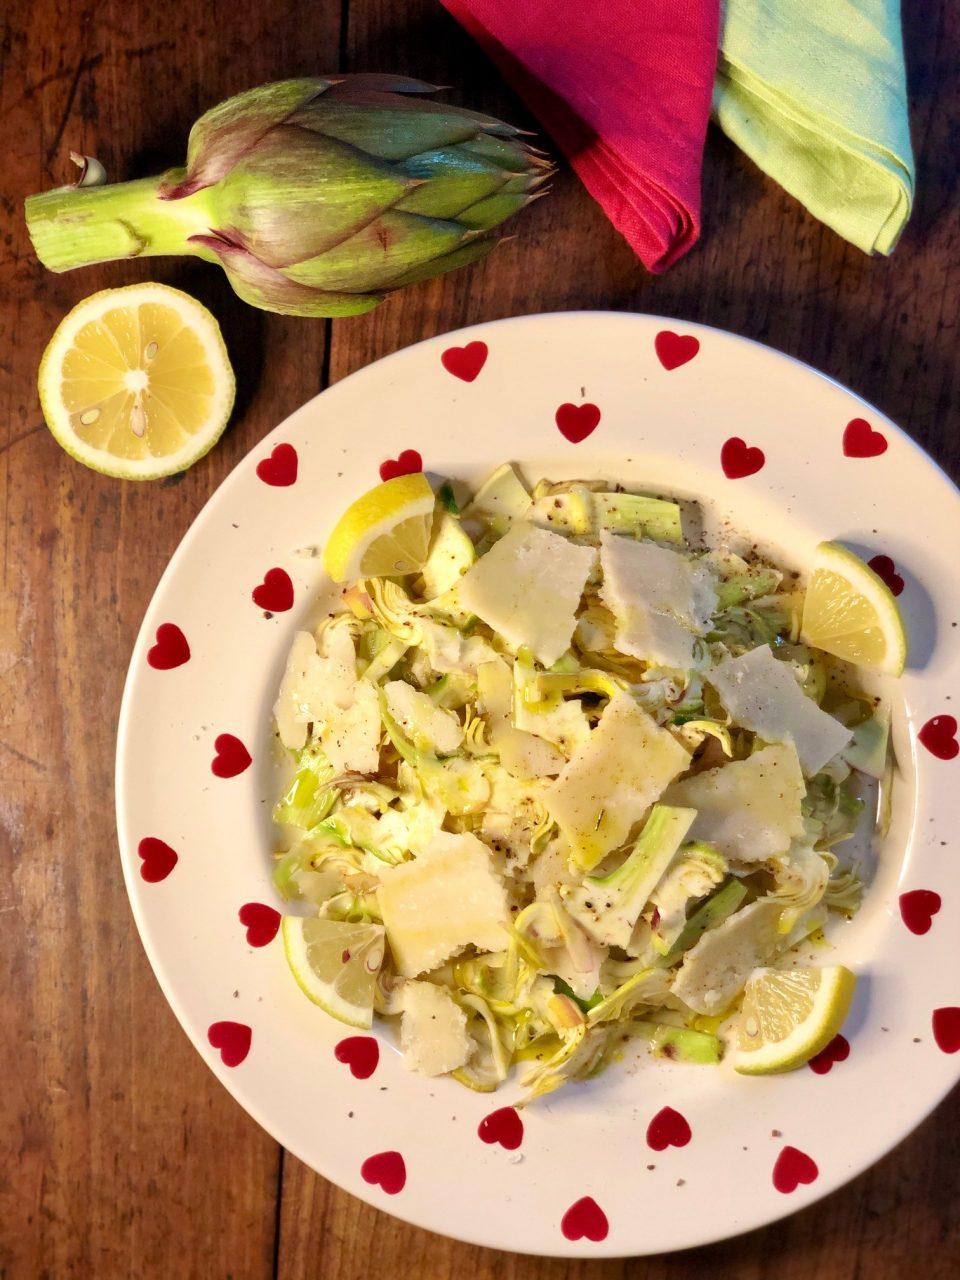 Carciofi crudi in insalata